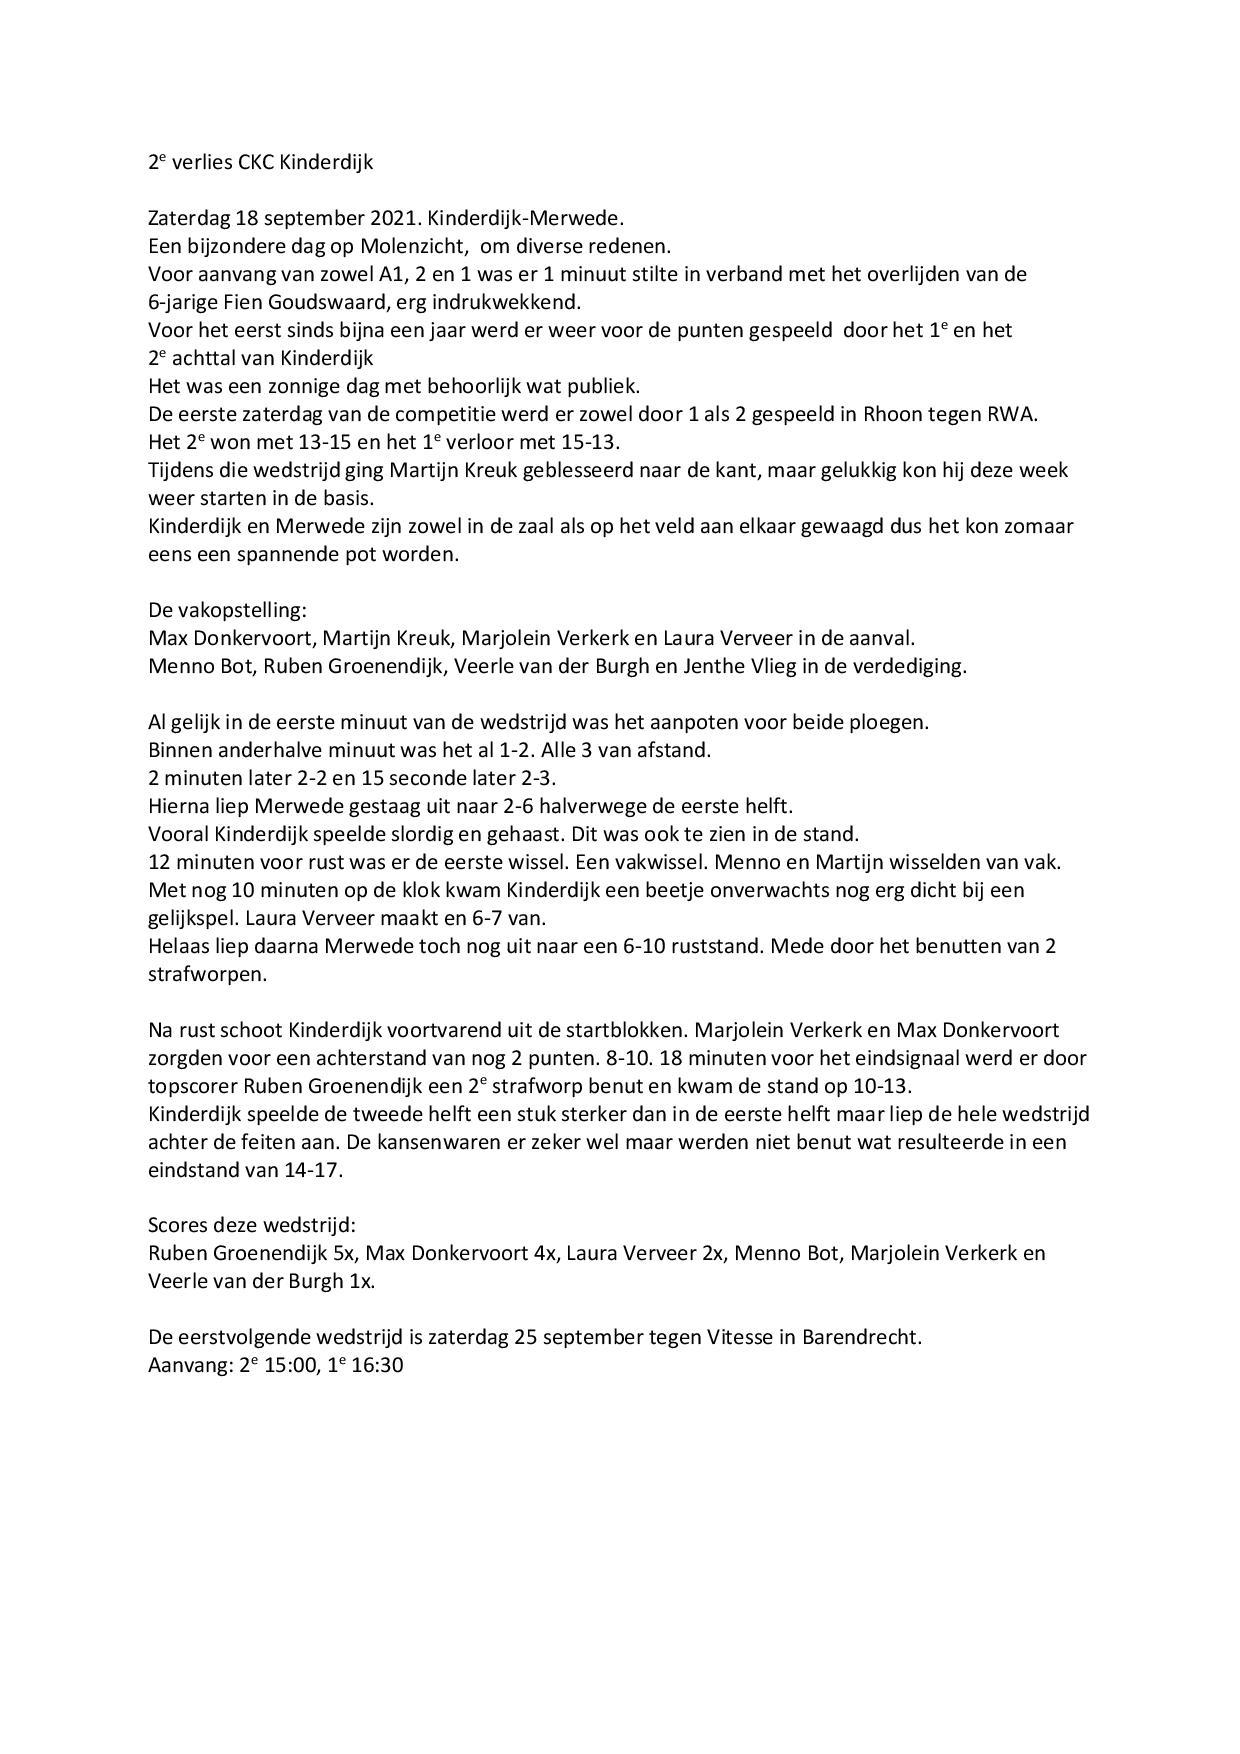 Wedstrijdverslag 18-09-2021 Kinderdijk - Merwede